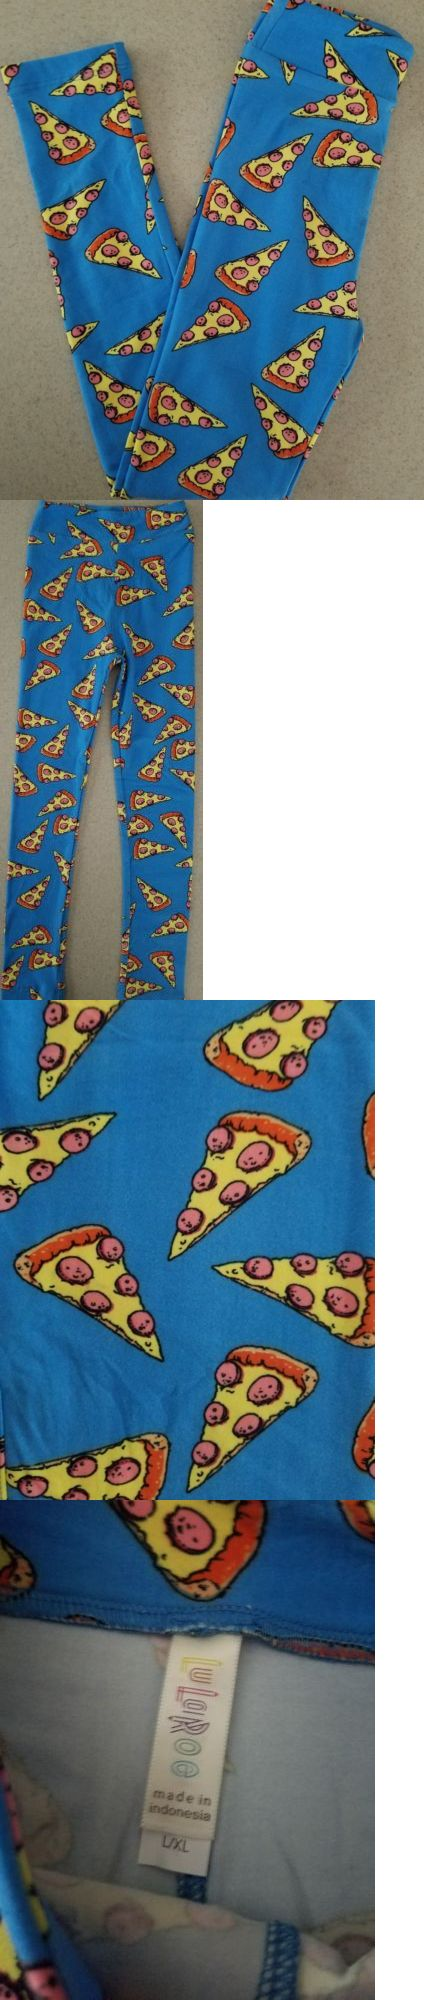 Leggings 152719: Lularoe Bnwot Children S L Xl Pizza Leggings -> BUY IT NOW ONLY: $30 on eBay!